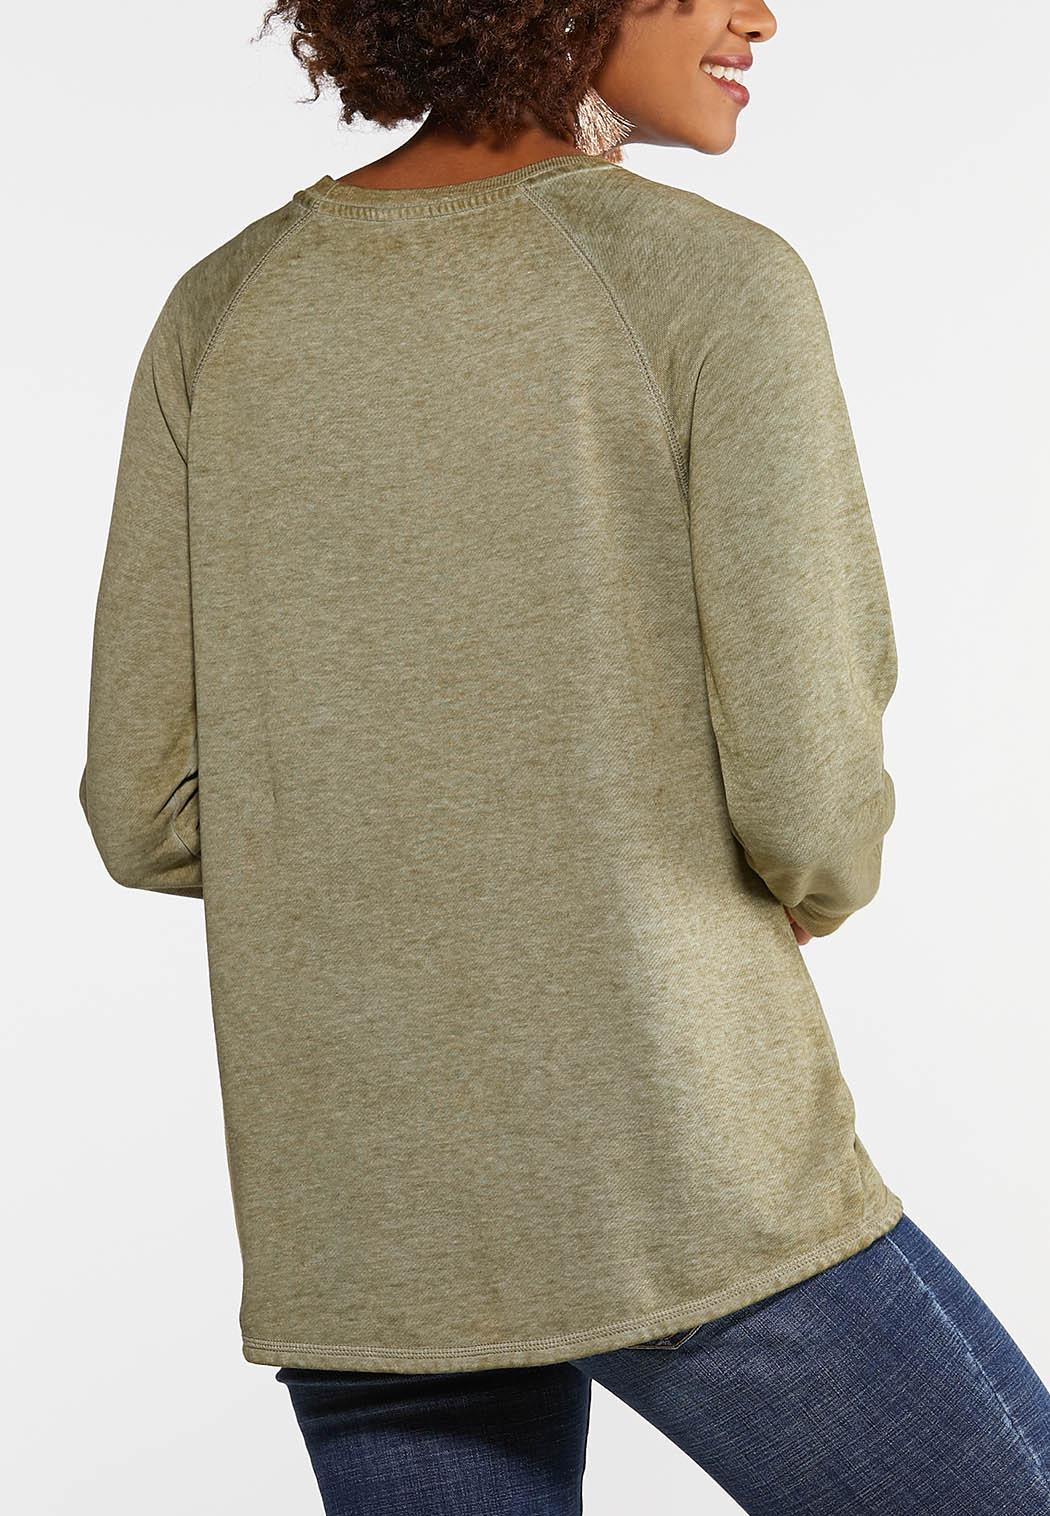 Plus Size Faith Hope Love Sweatshirt (Item #44027013)